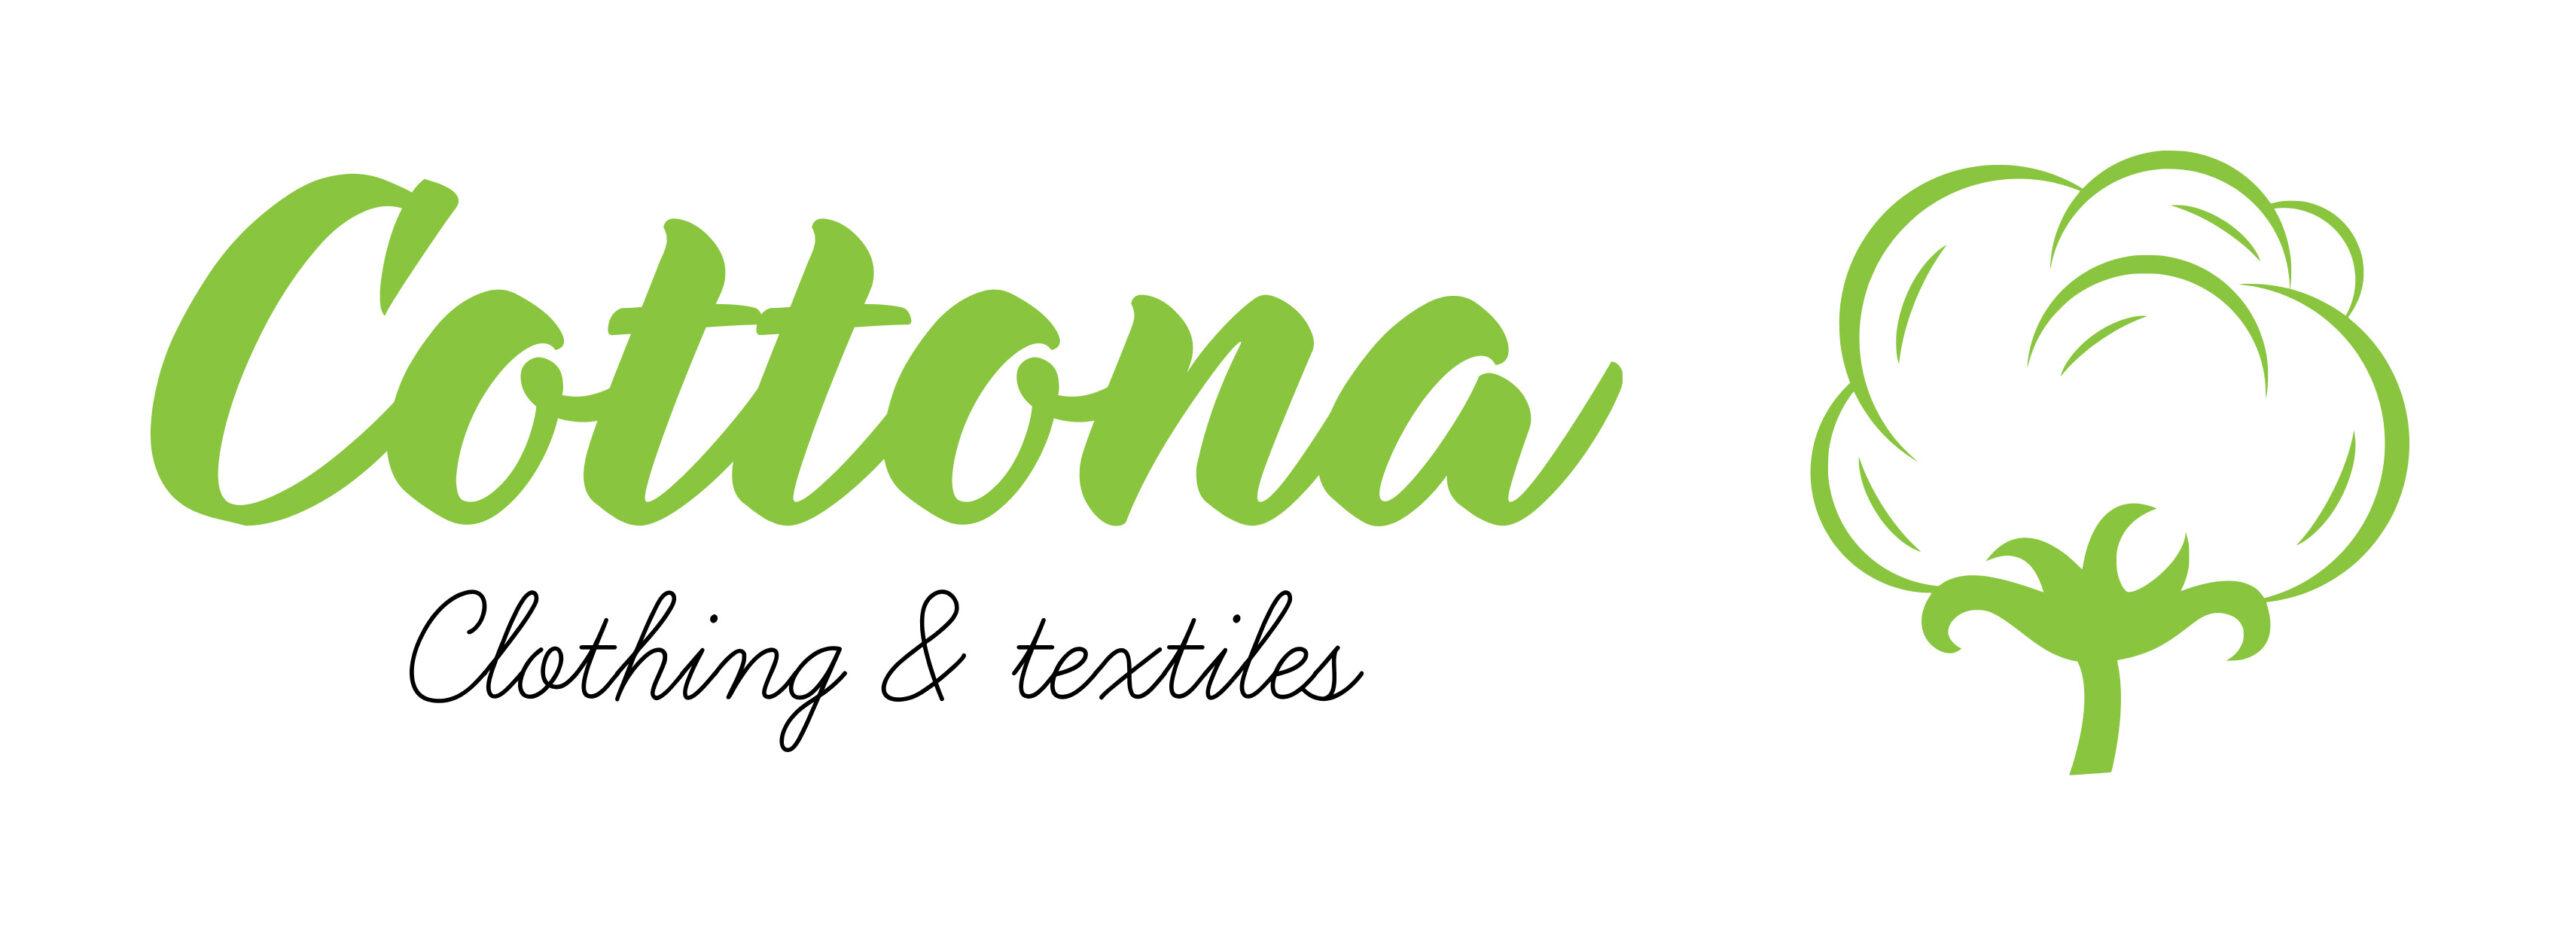 Cottona Store